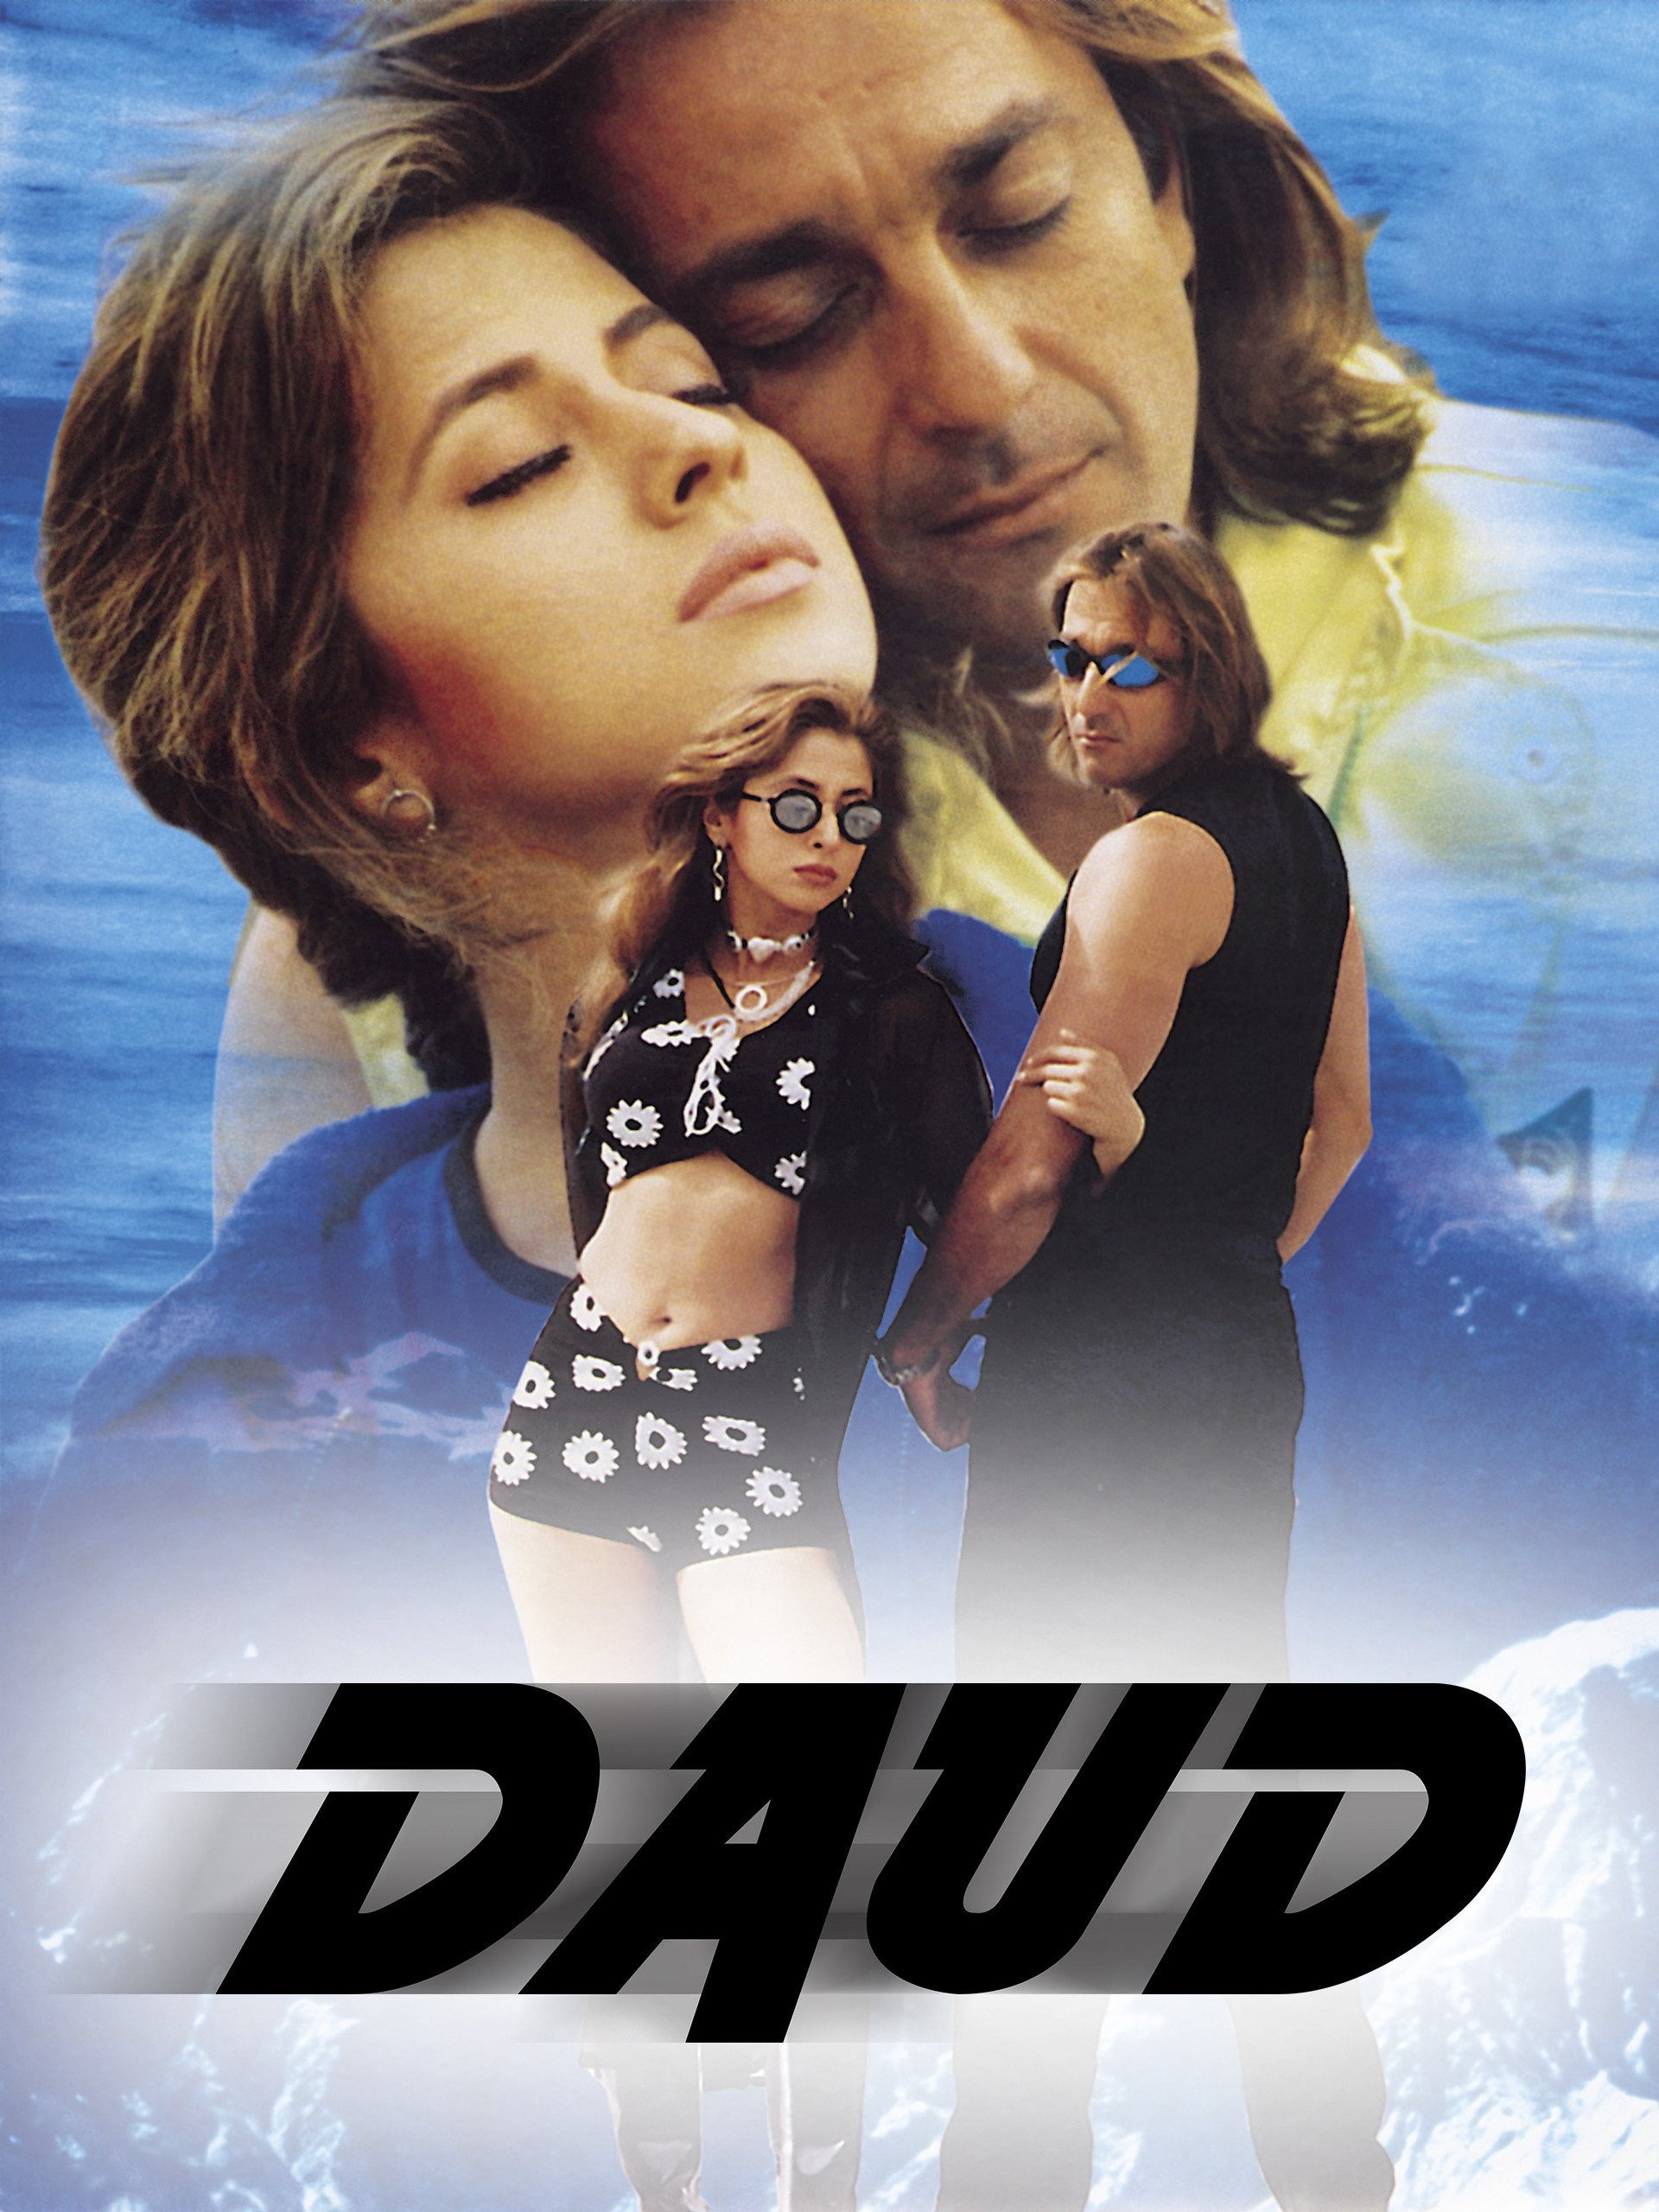 Watch Daud | Prime Video